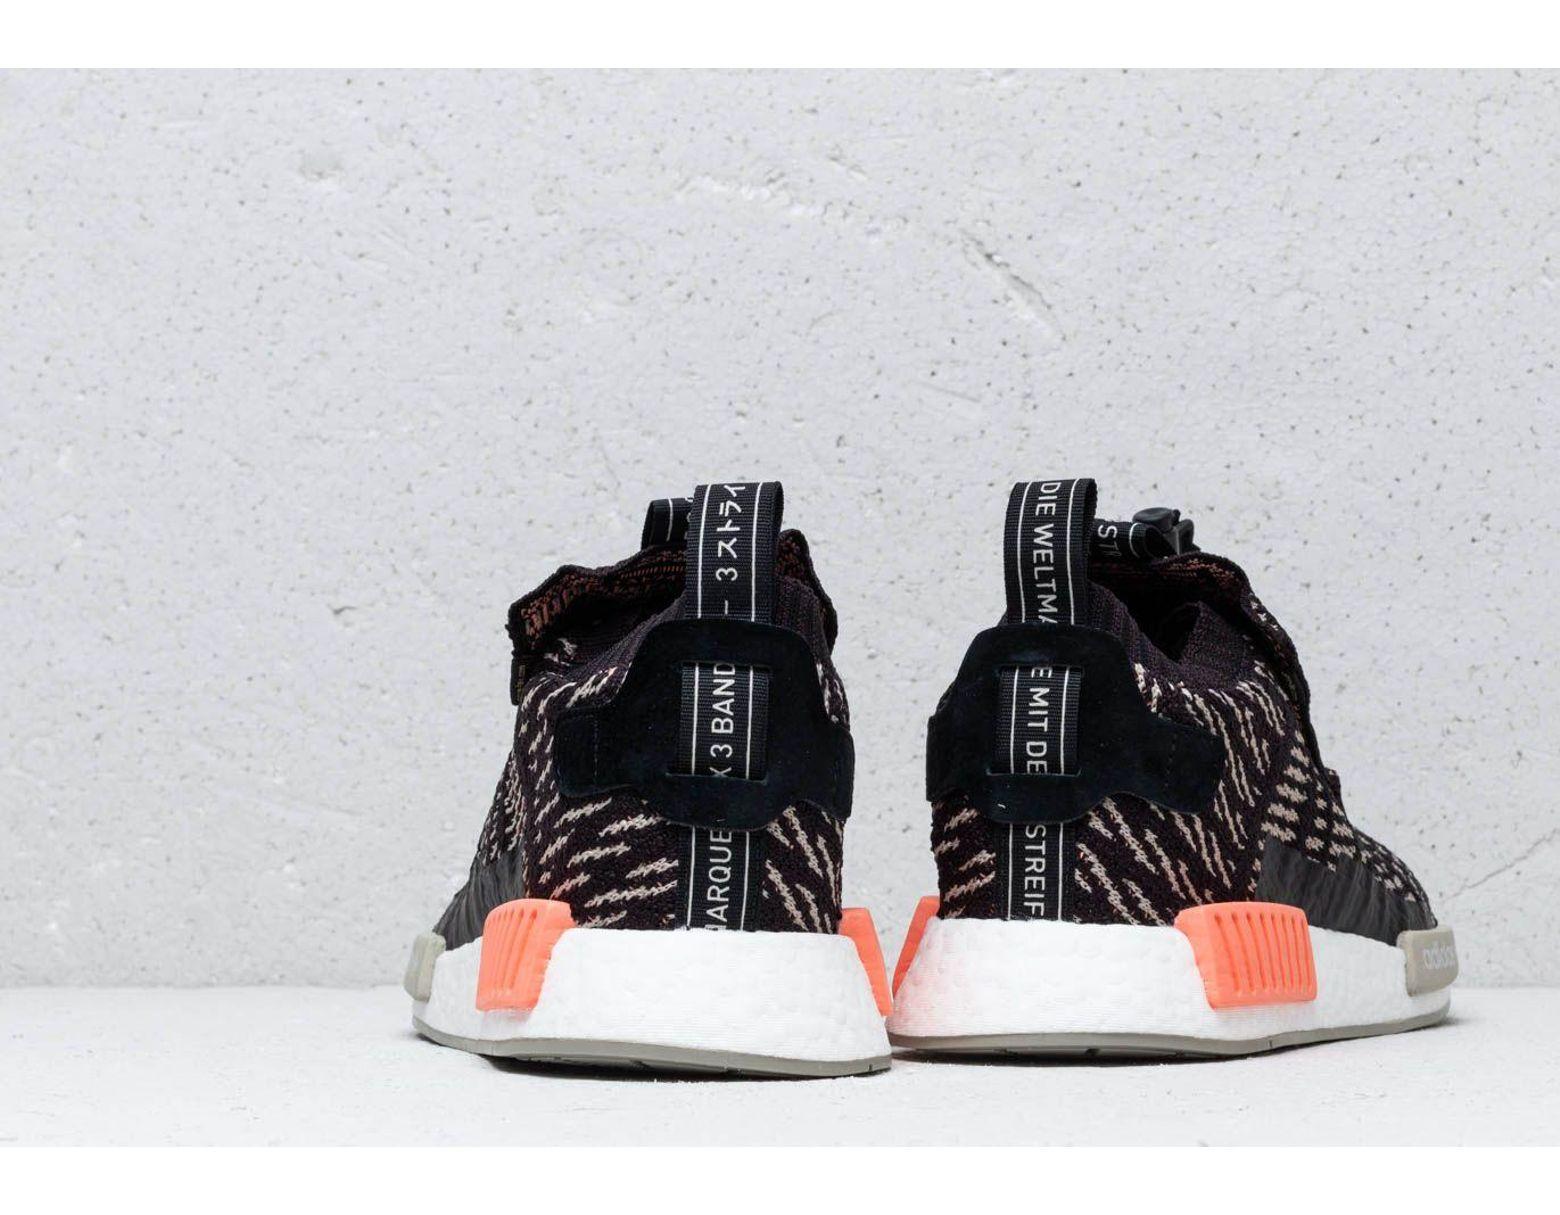 c4d4c182102f0 Lyst - adidas Originals Adidas Nmd Ts1 Pk Gtx Core Black  Sesame  Chalk  Coral in Black for Men